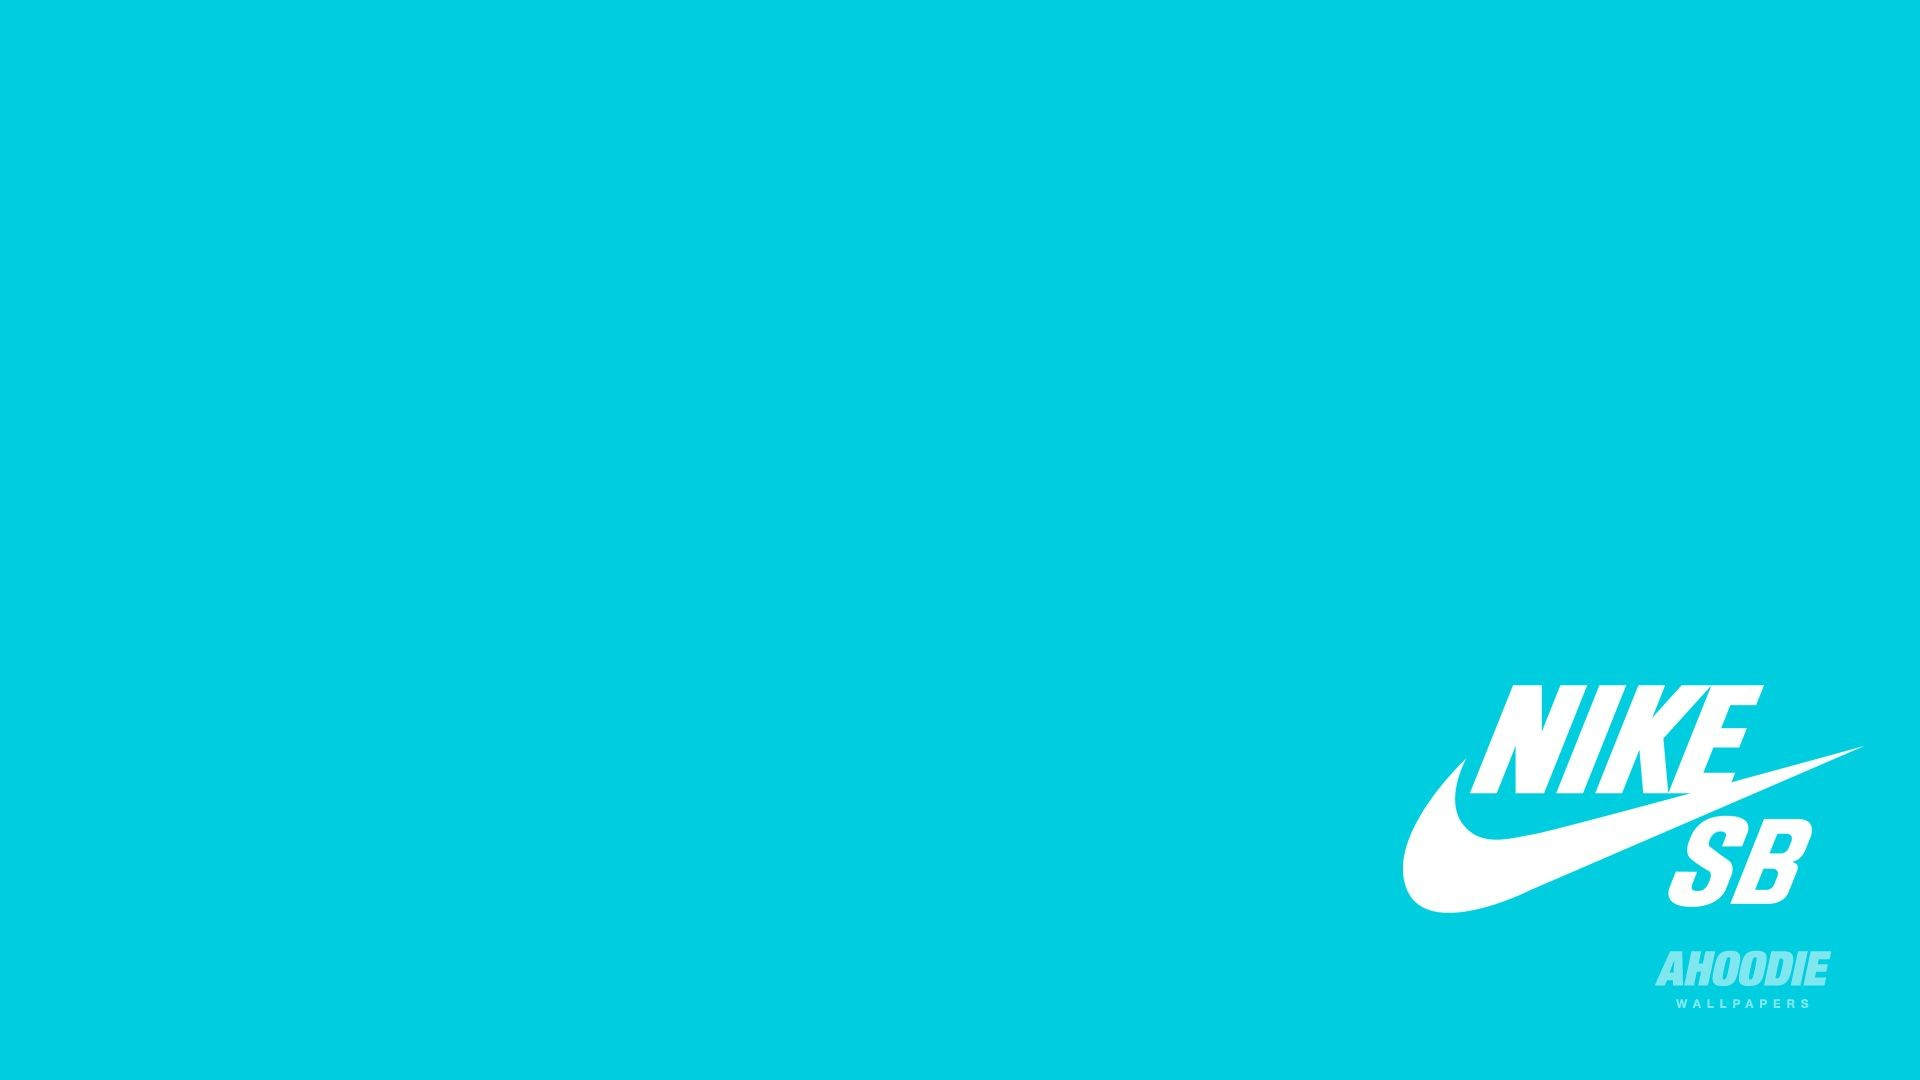 Res: 1920x1080, 0  Nike Sb Logo Wallpaper  Nike Sb Logo Wallpaper